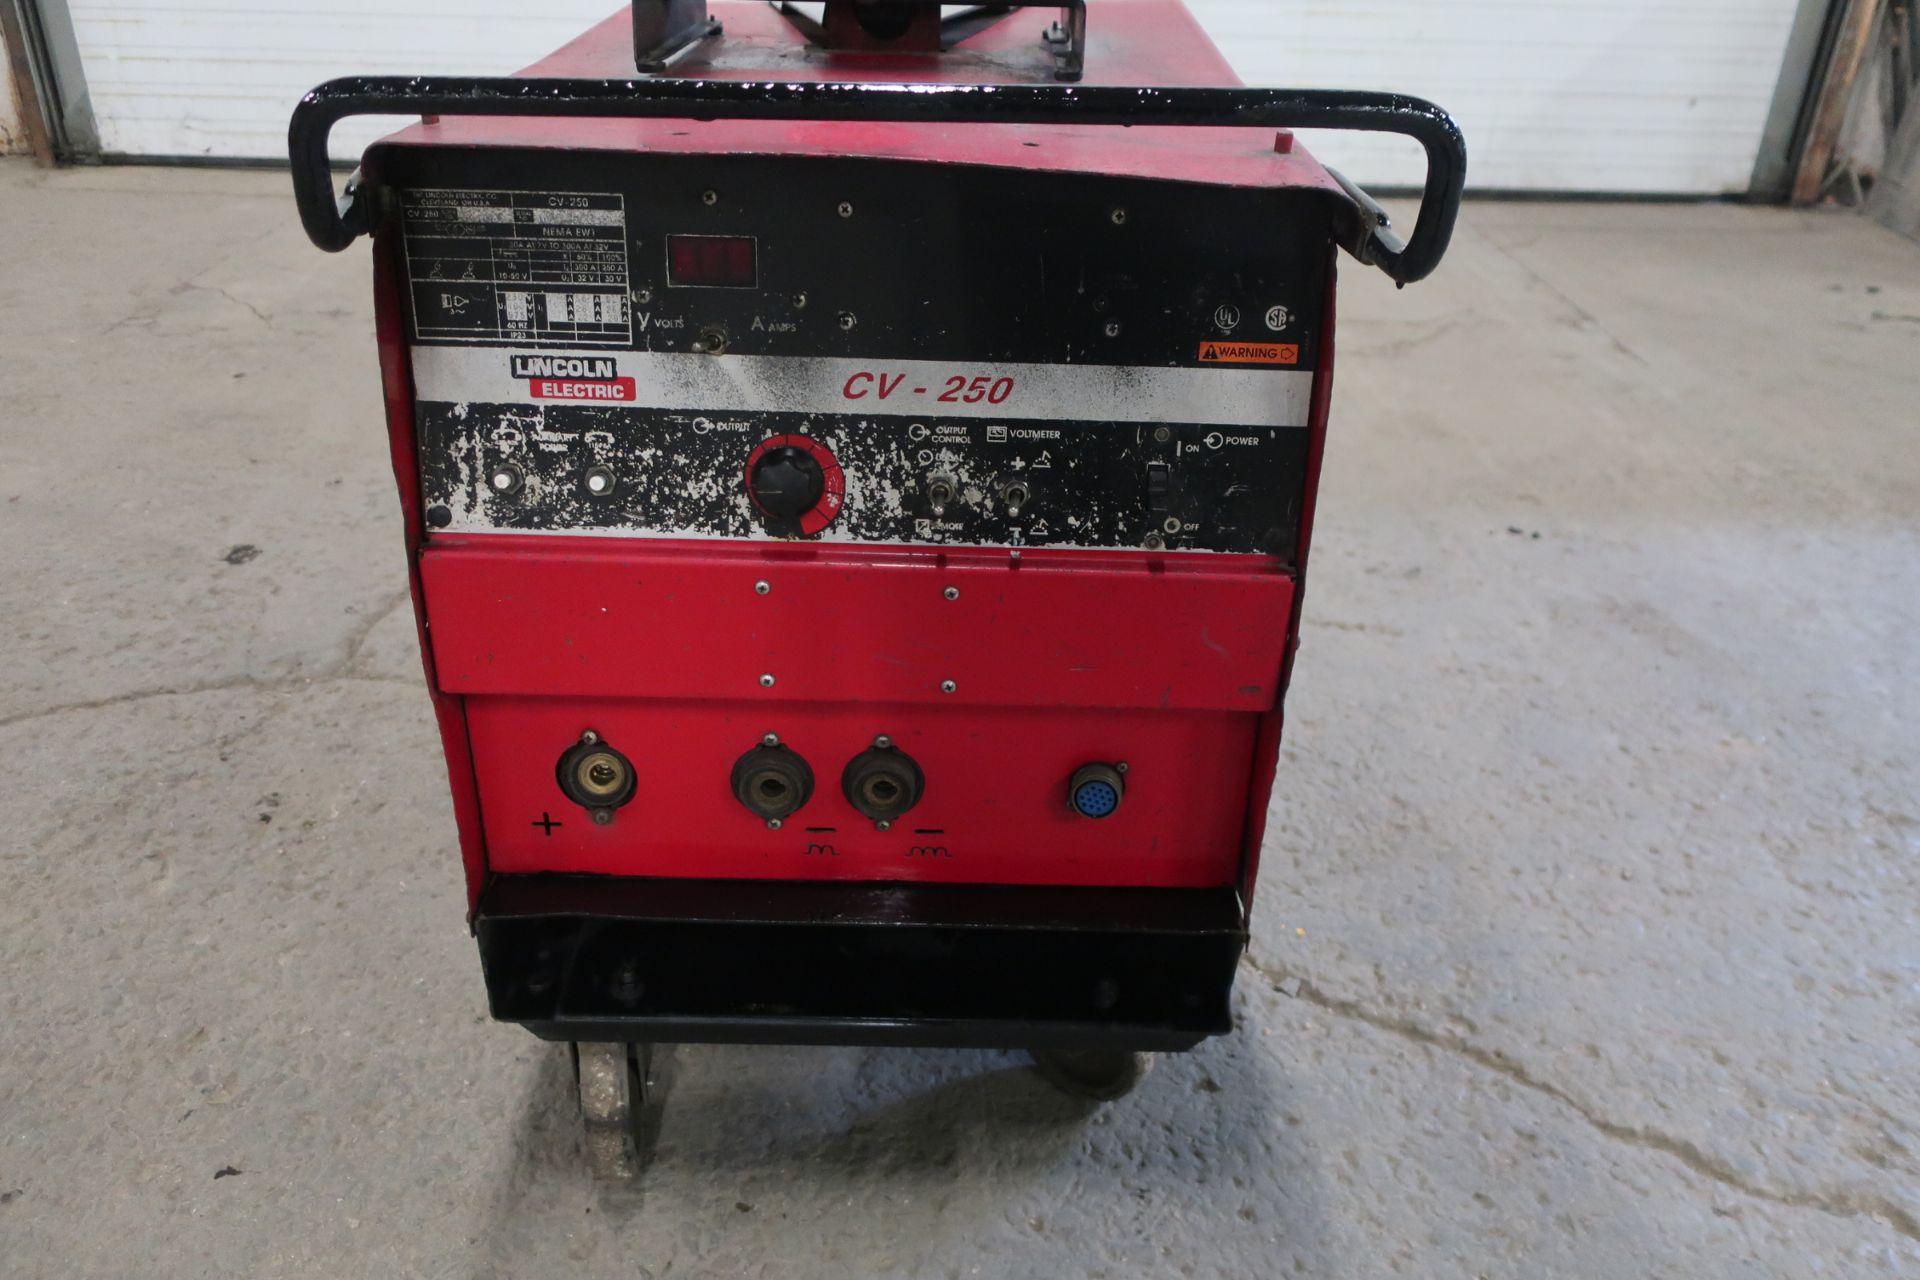 Lincoln CV-250 Mig Welder - 250 amp 3 phase